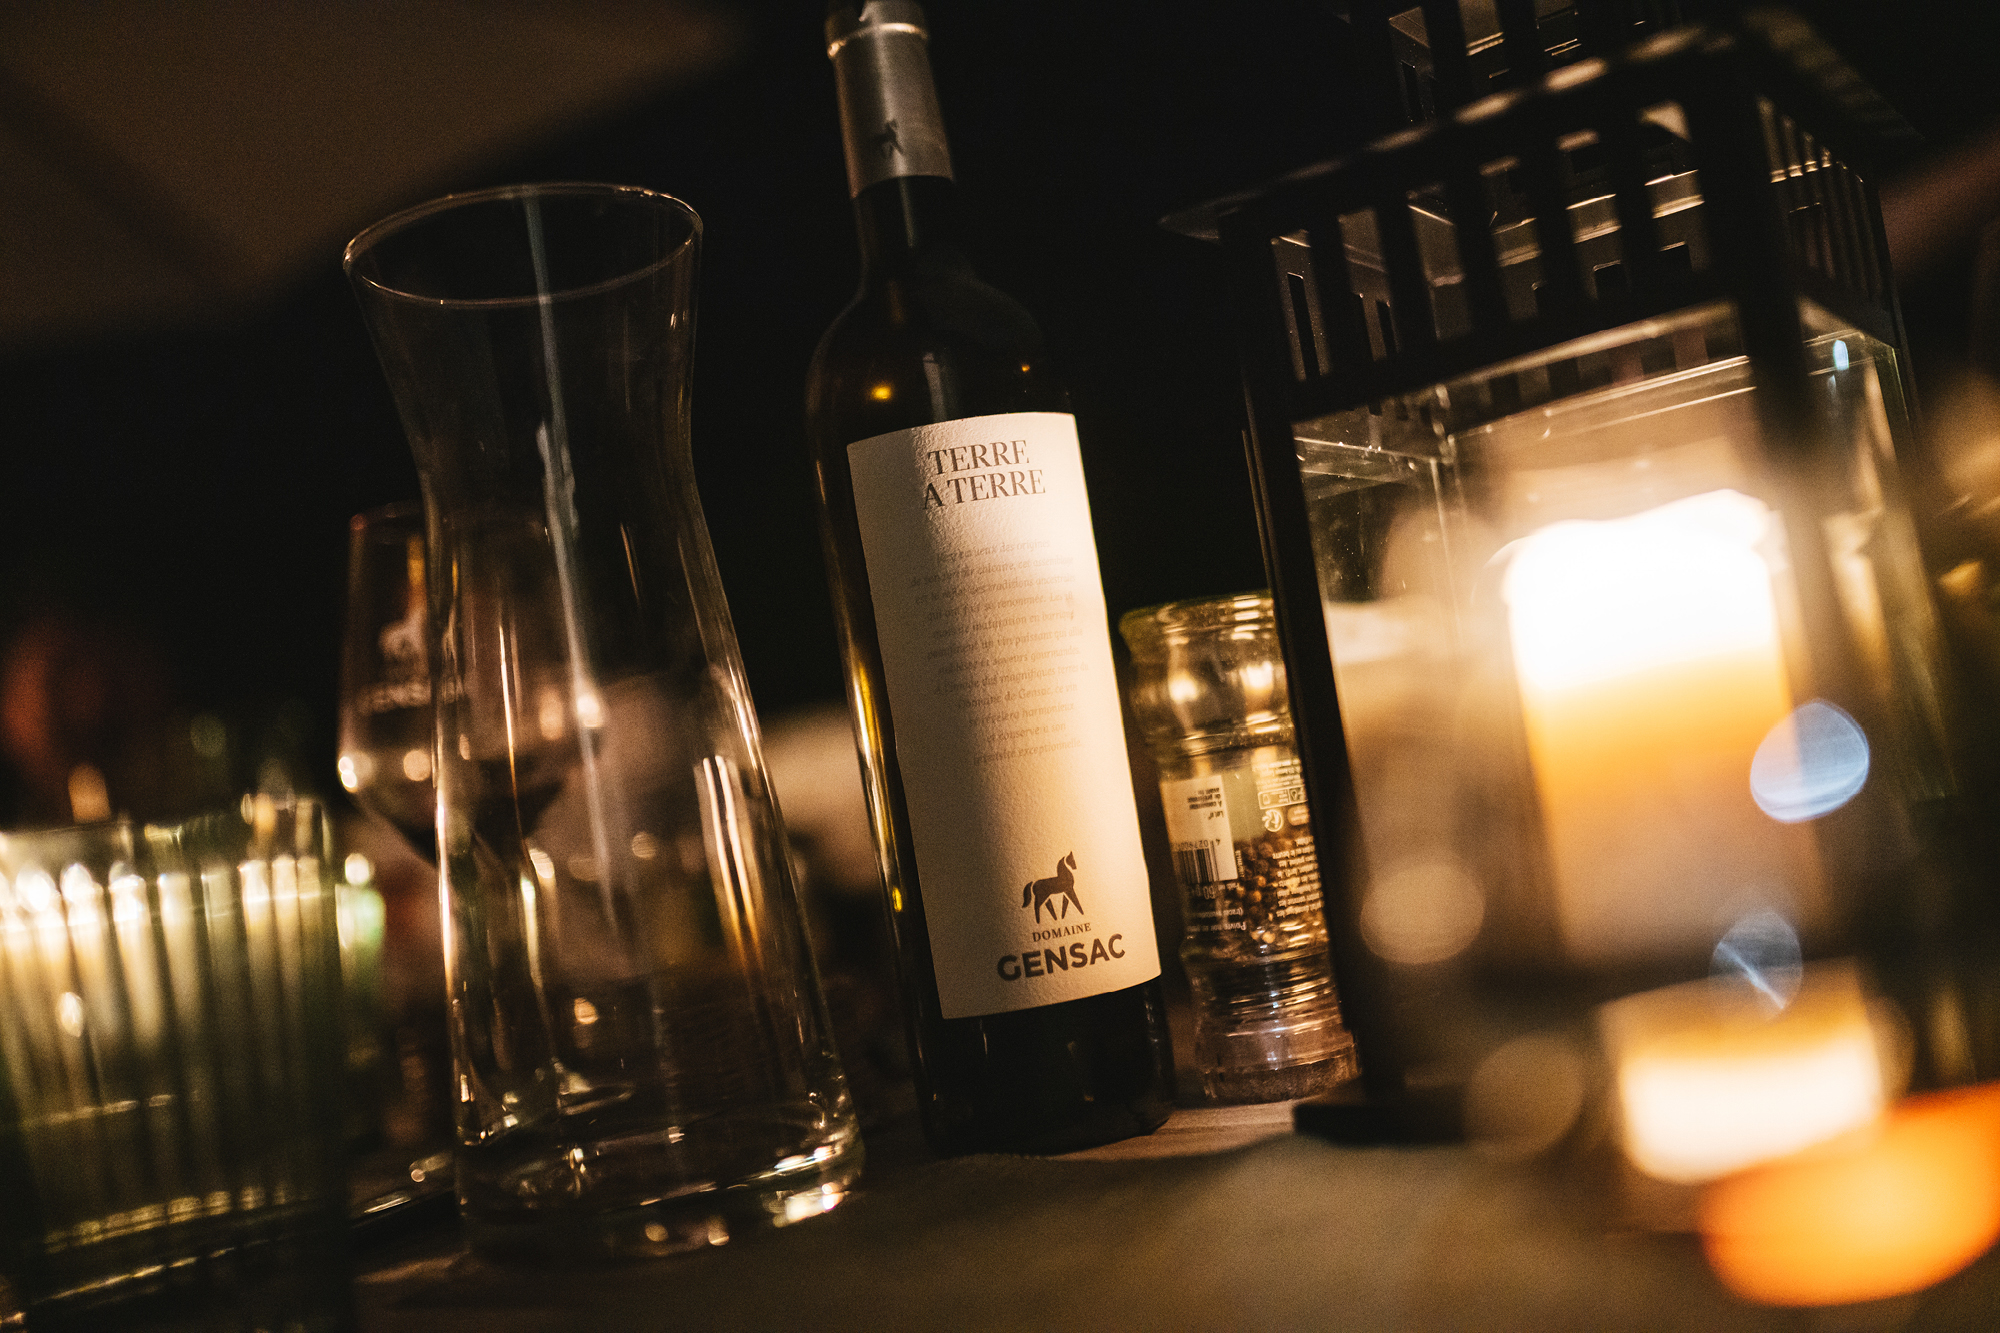 Domaine Gensac Terre A Terre wine